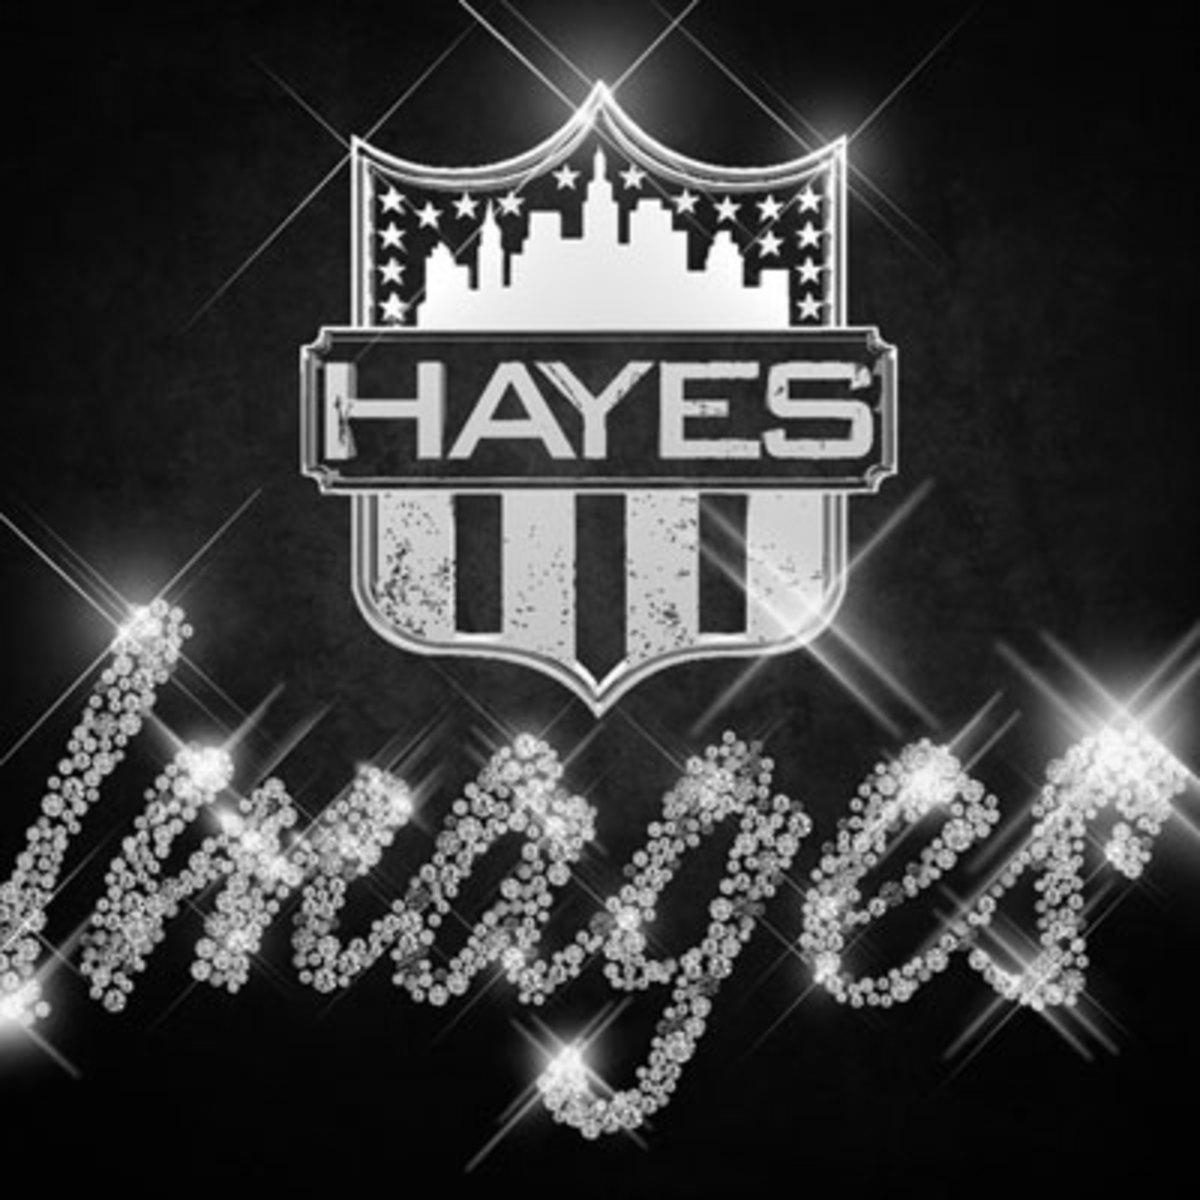 hayes-images.jpg